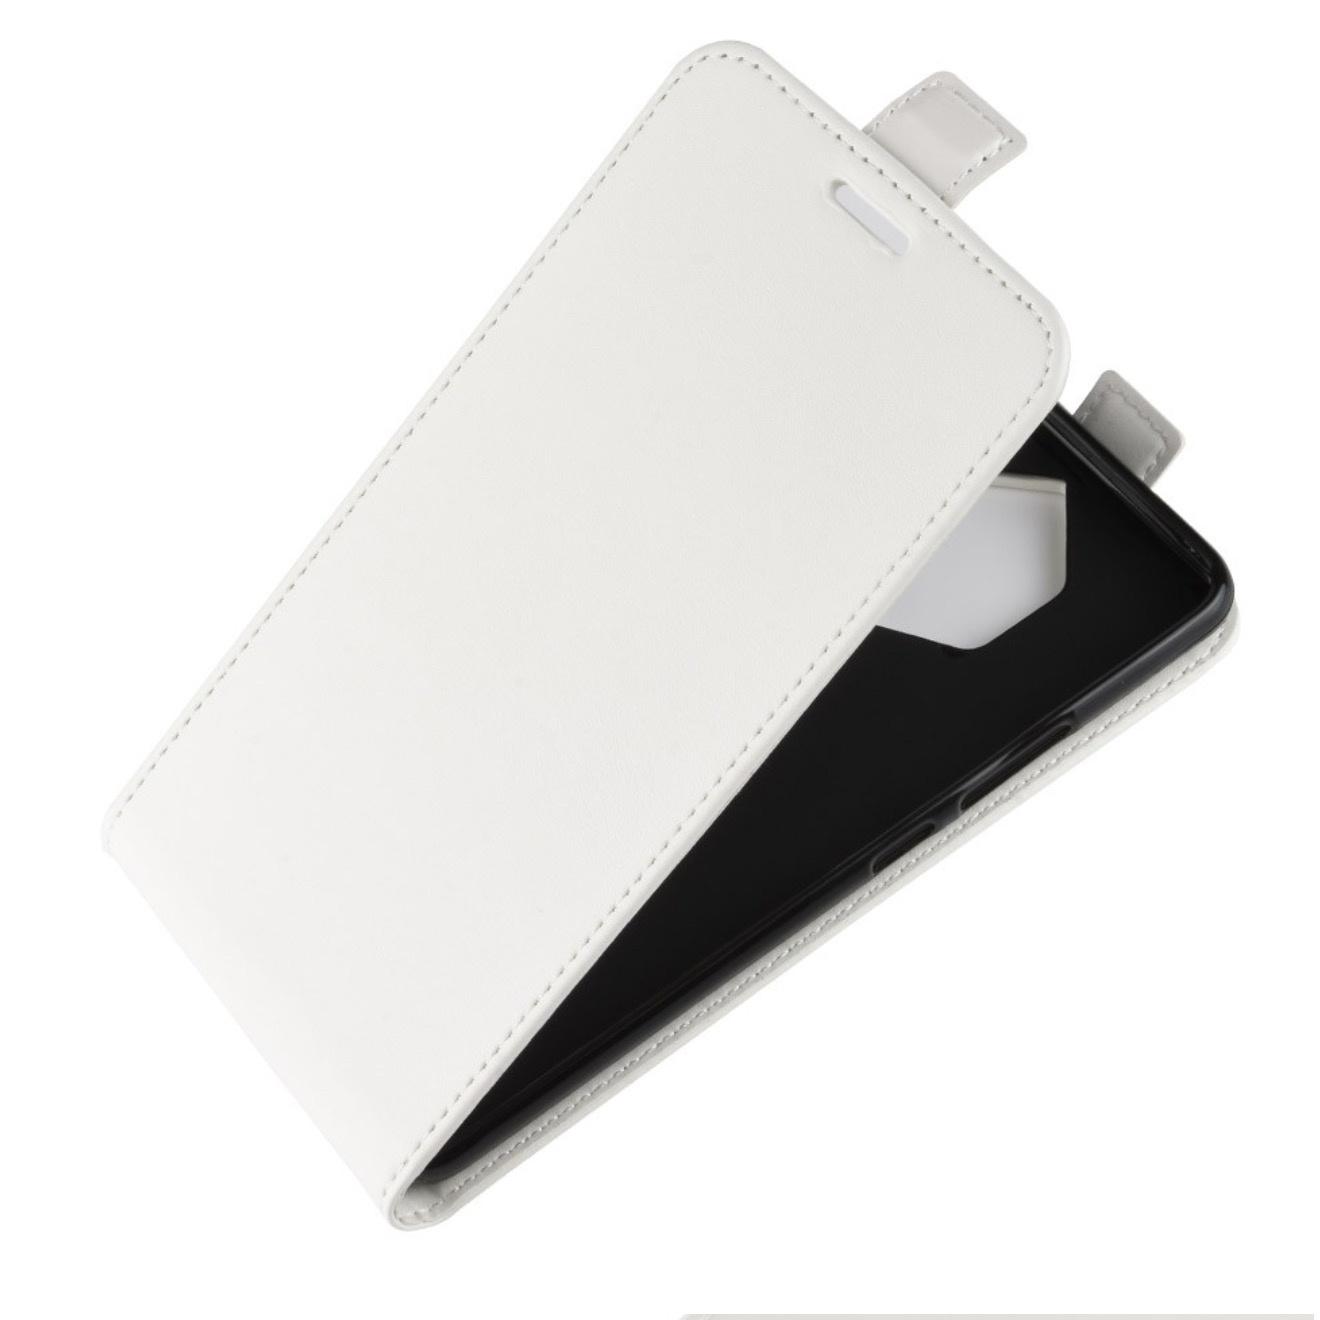 Чехол-флип MyPads для ASUS Zenfone 6 A600CG/A601CG вертикальный откидной белый for asus zenfone 6 a600cg new full black lcd display panel screen monitor digitizer touch screen glass assembly replacement